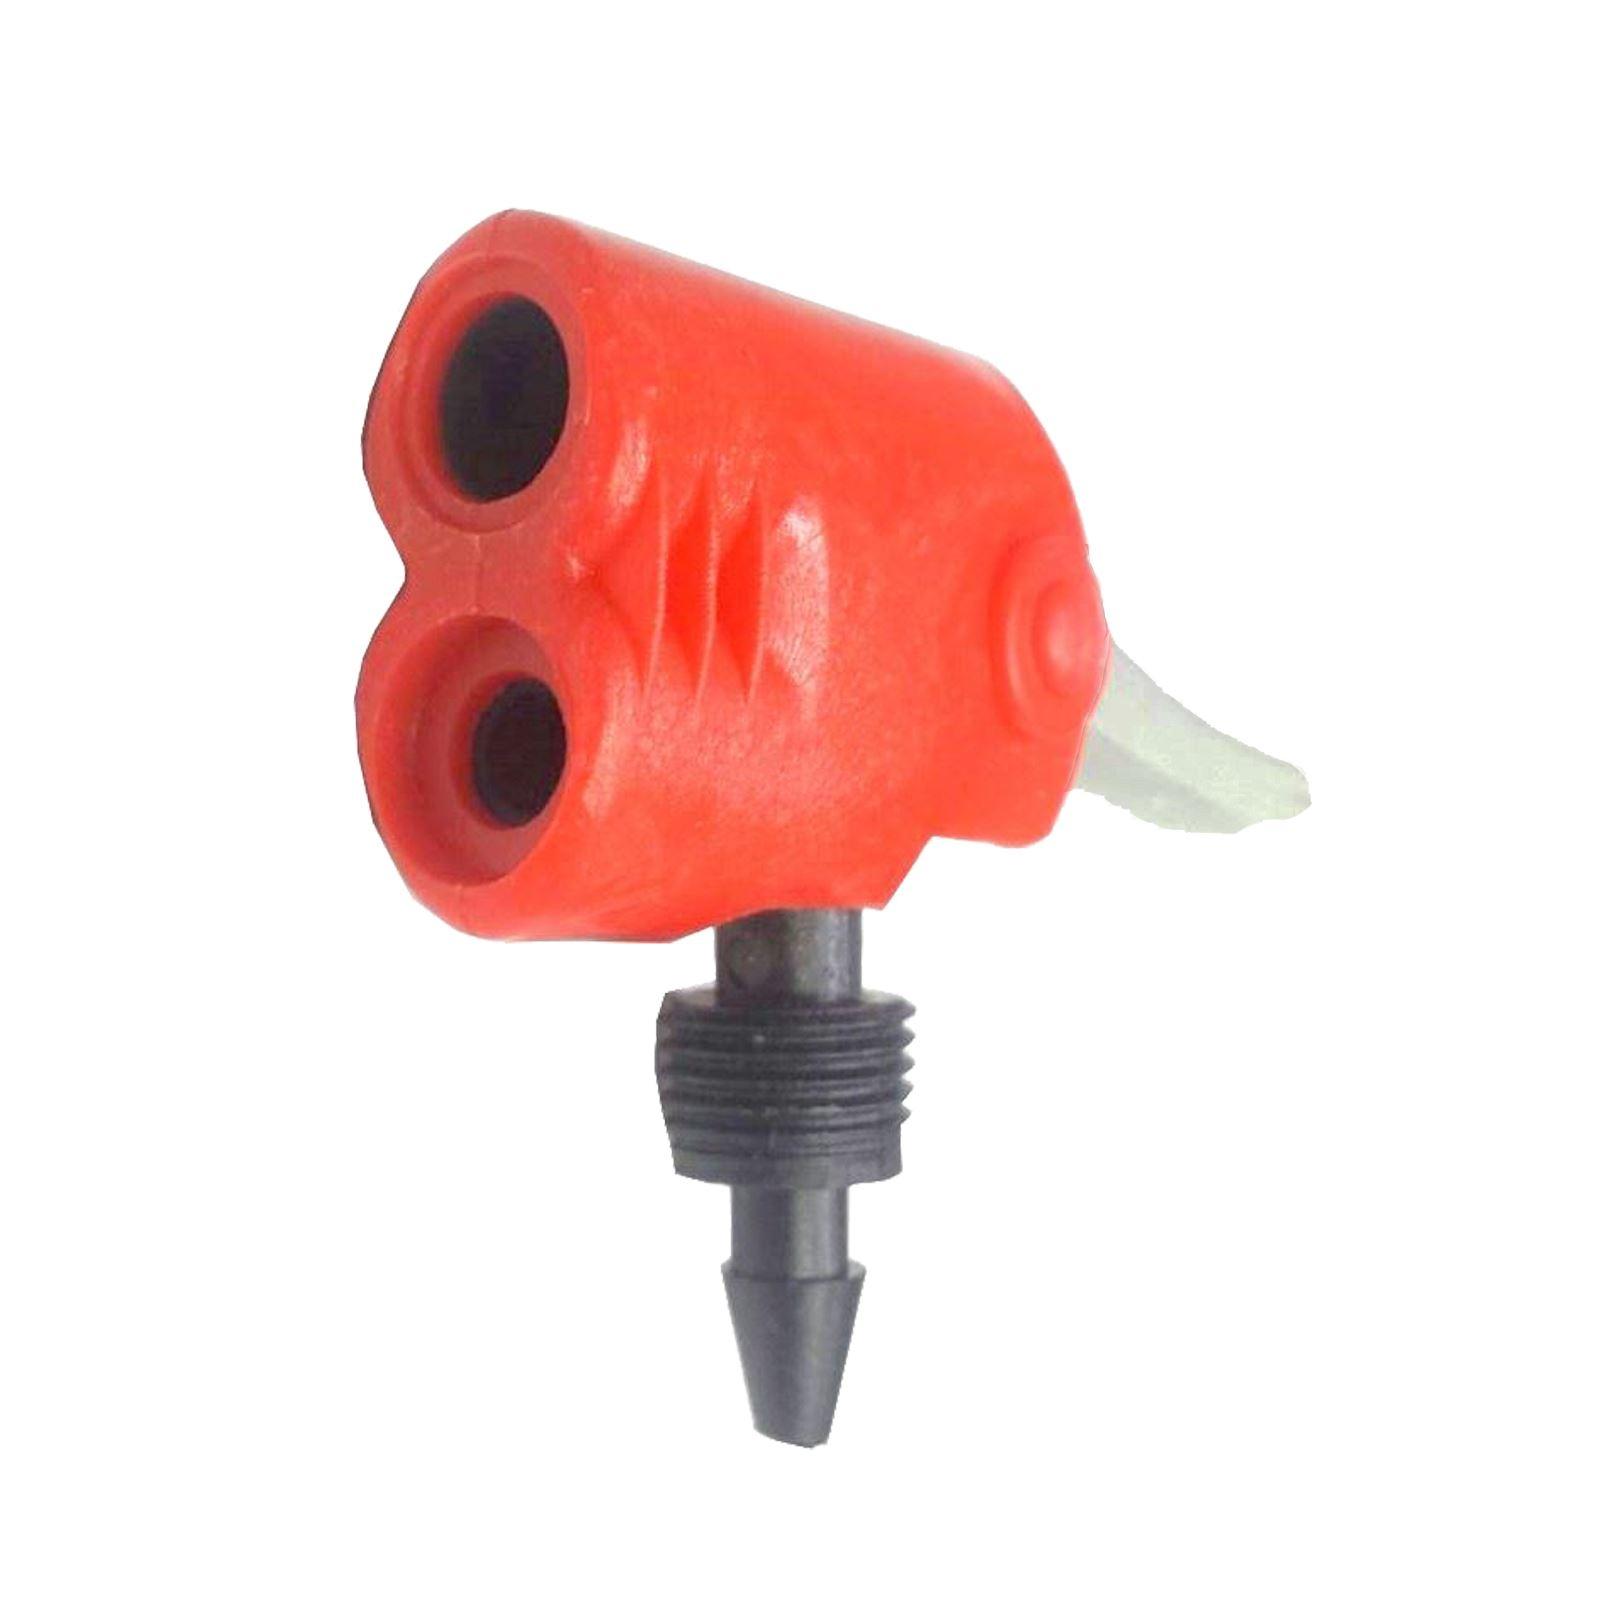 Bicyle Bike Track Pump Nozzle Dual Head Adapter Schrader//Presta Valve Convertor